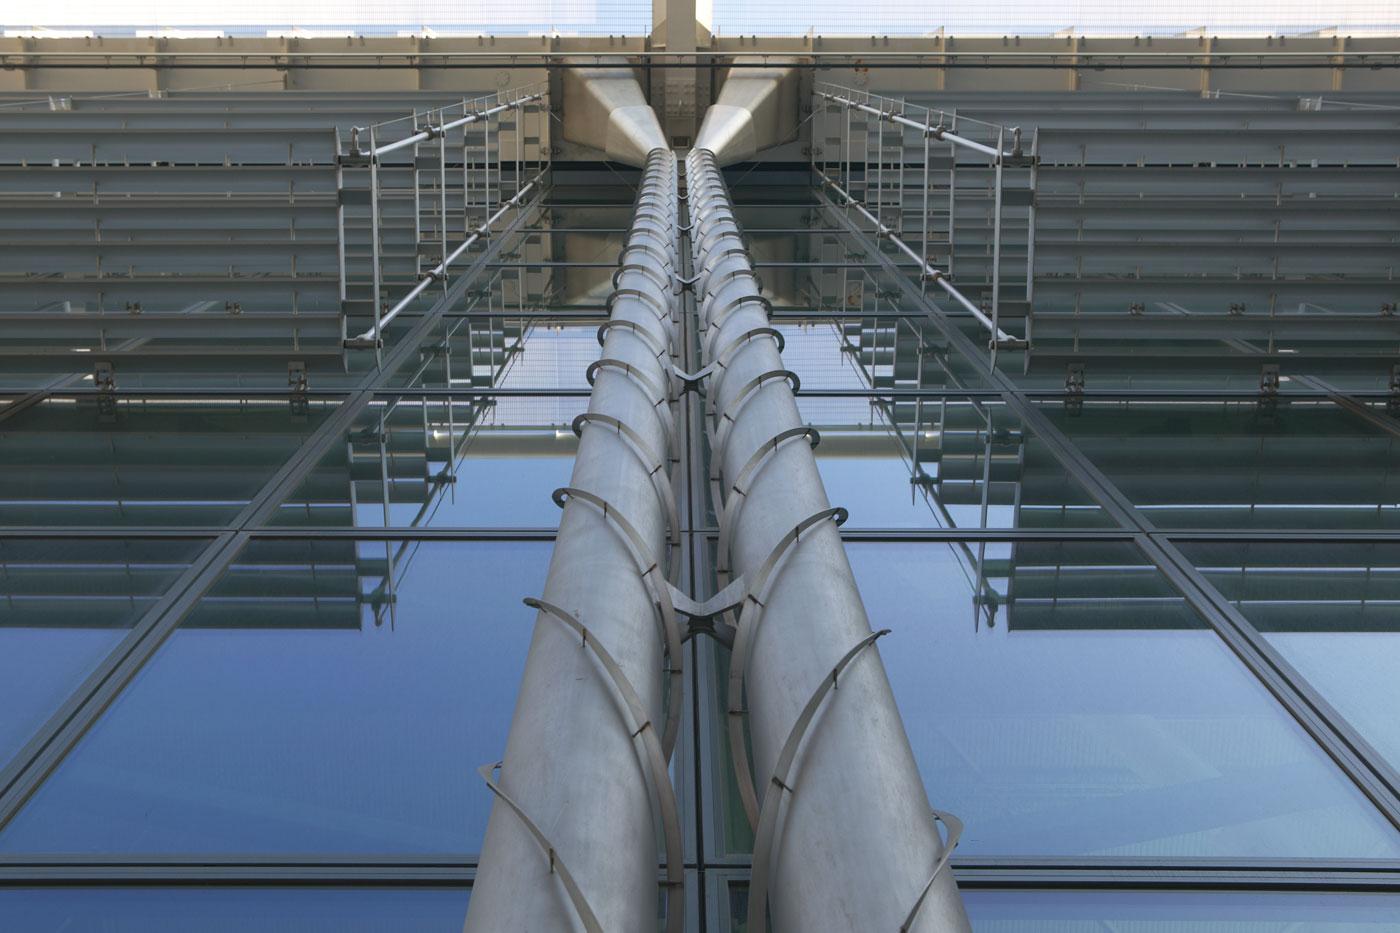 Heathrow Airport Terminal 5 glazed decorative drain system | Commercial Building Photographer